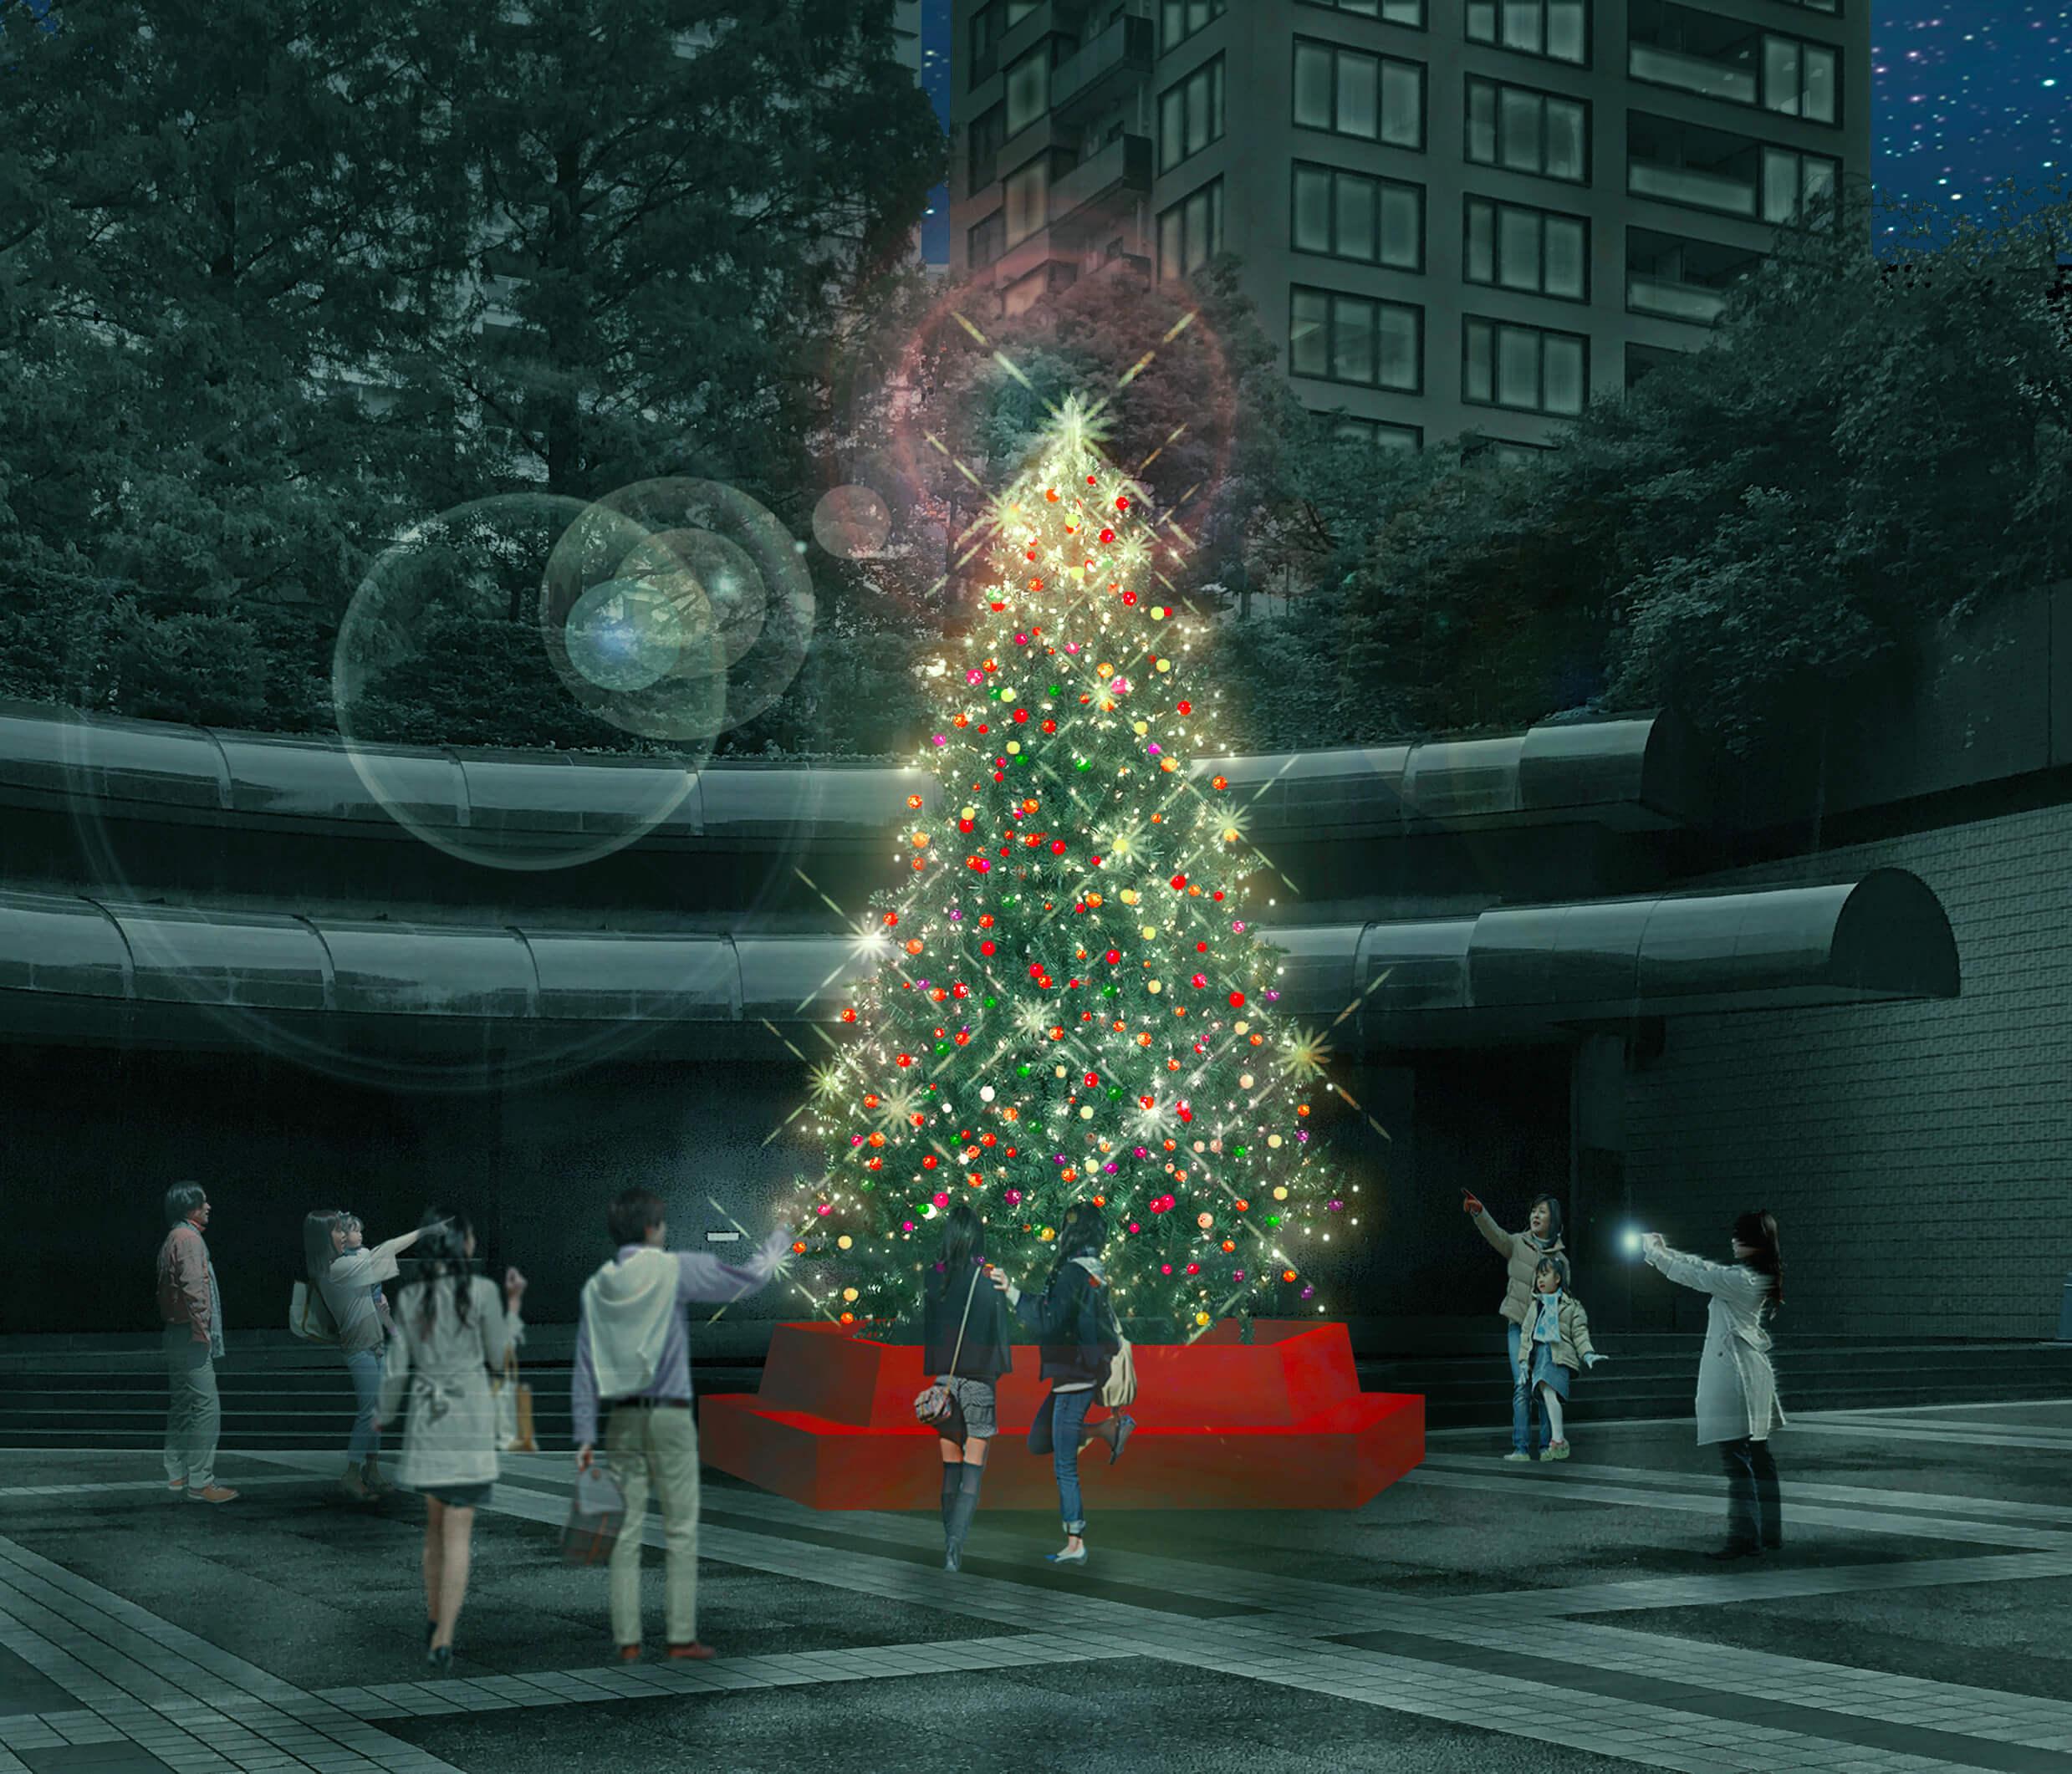 Ark Hills也登場杉樹的聖誕樹!舉辦「ARK HILLS CHRISTMAS 2018」 ARK HILLS_、聖誕節、